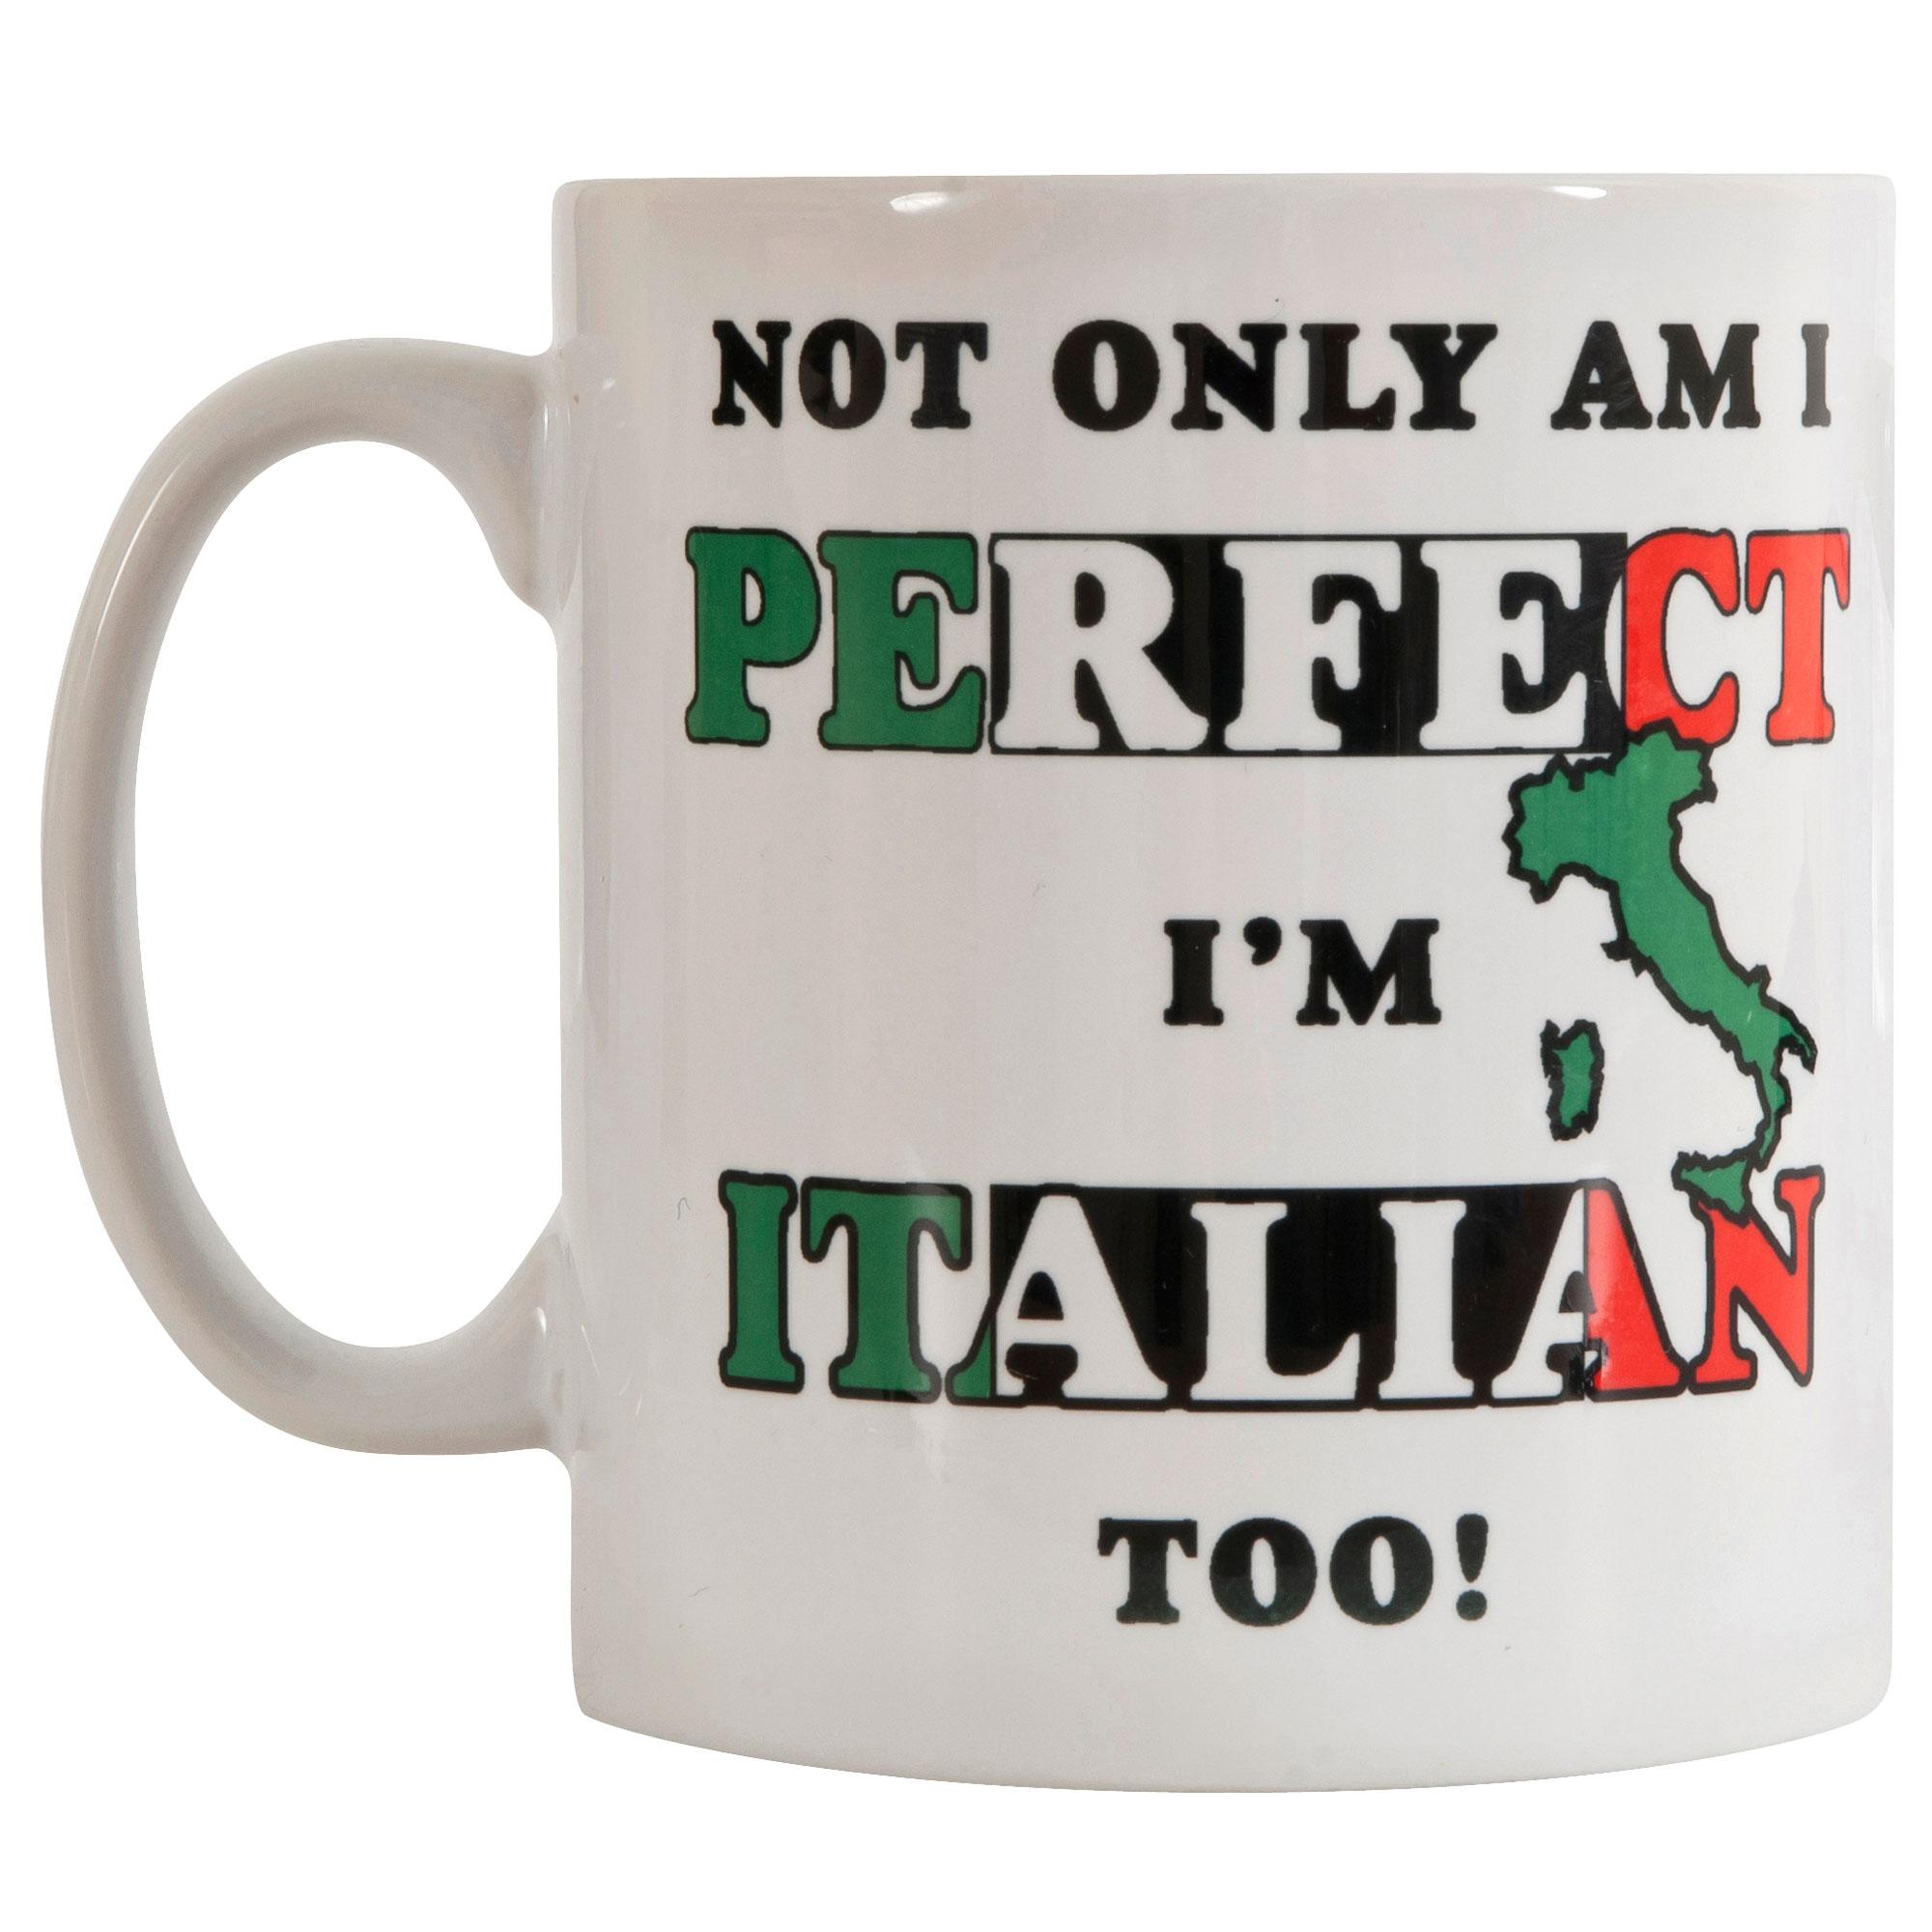 Not Only Am I Perfect, I'm Italian Too! Mug - OS